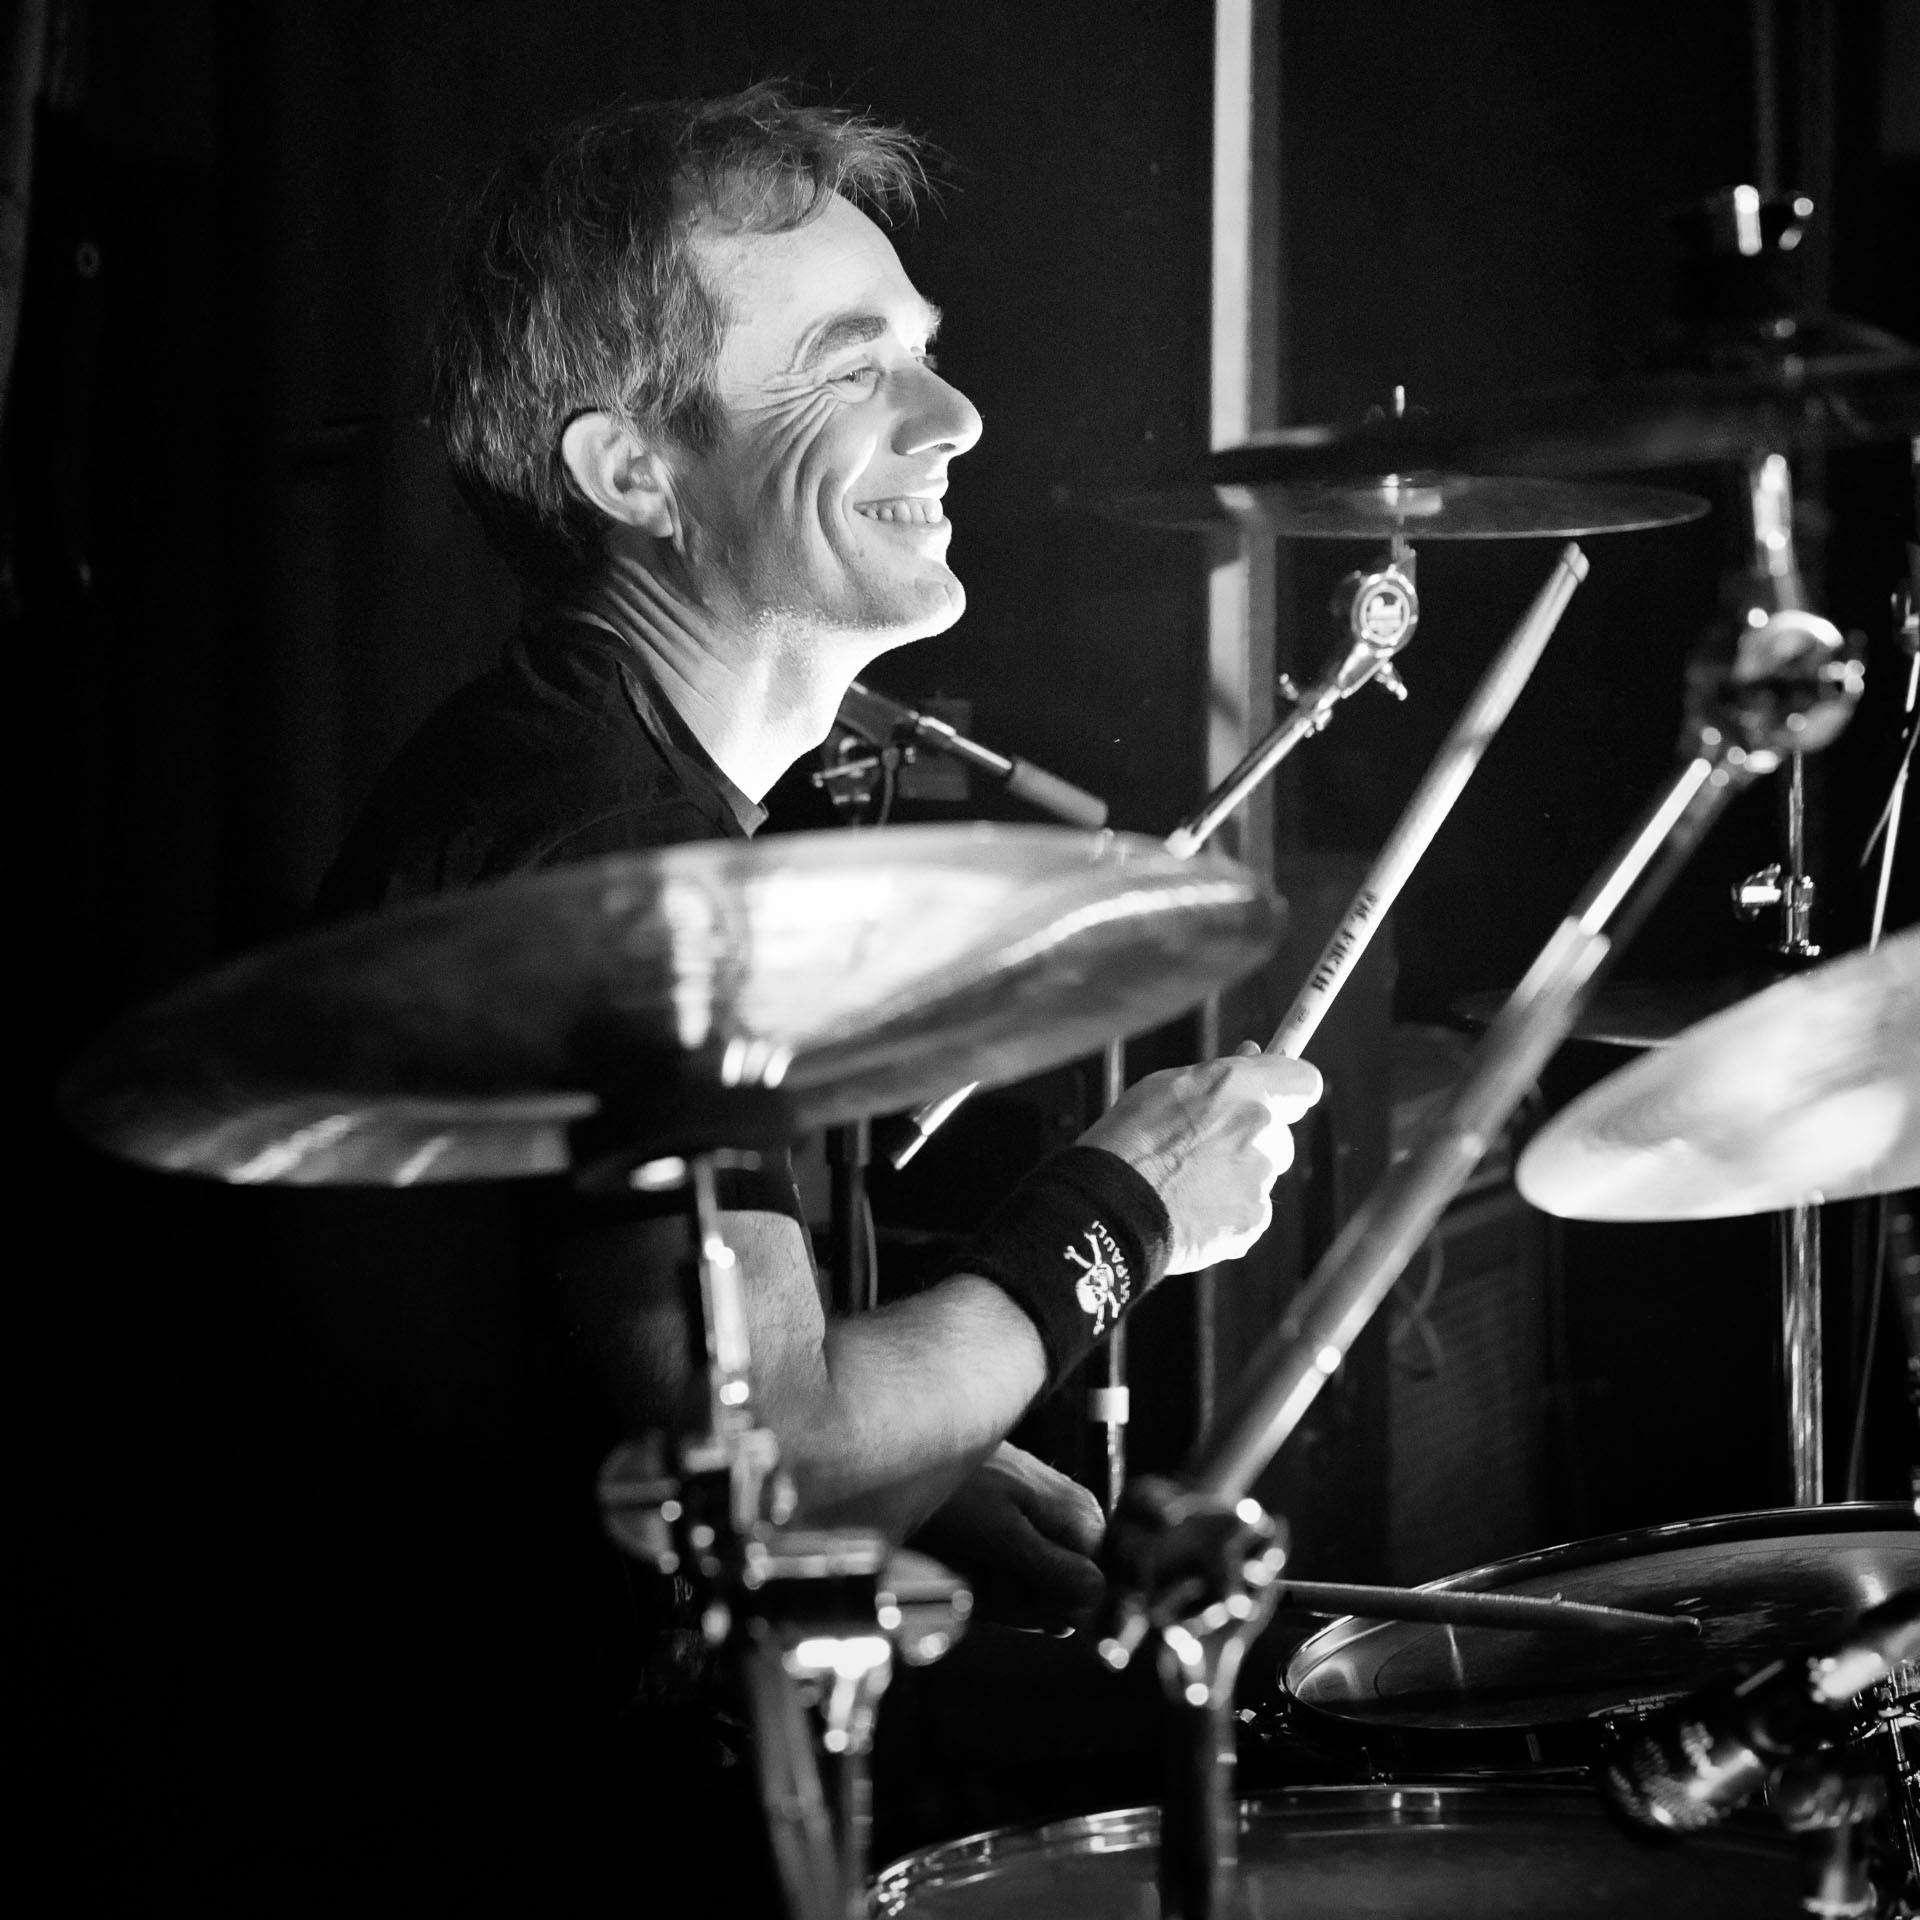 Ron Coolen drummer